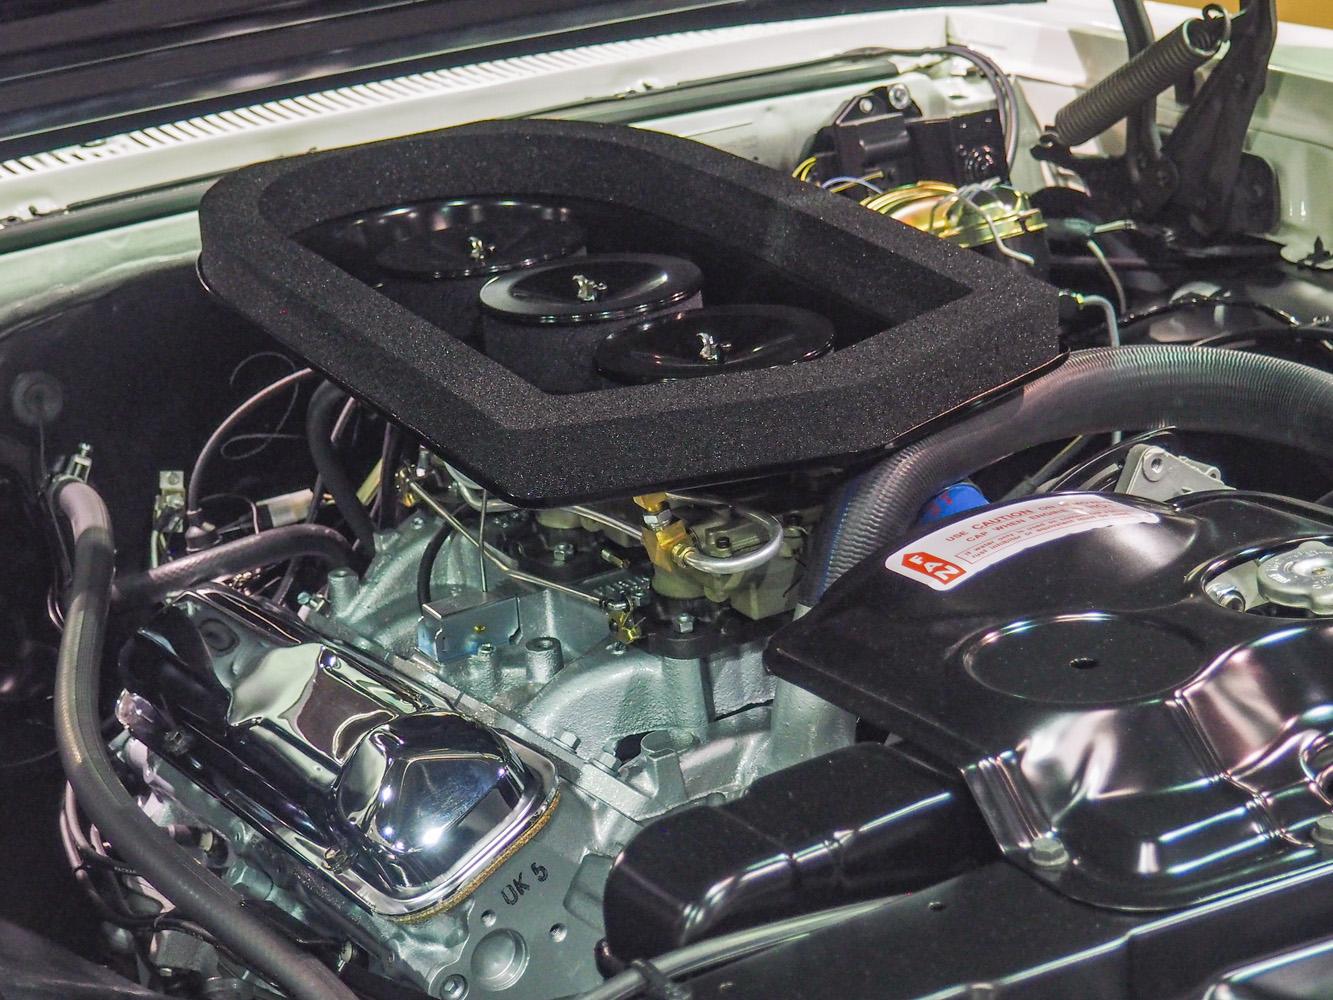 1966 Pontiac Ram Air GTO engine